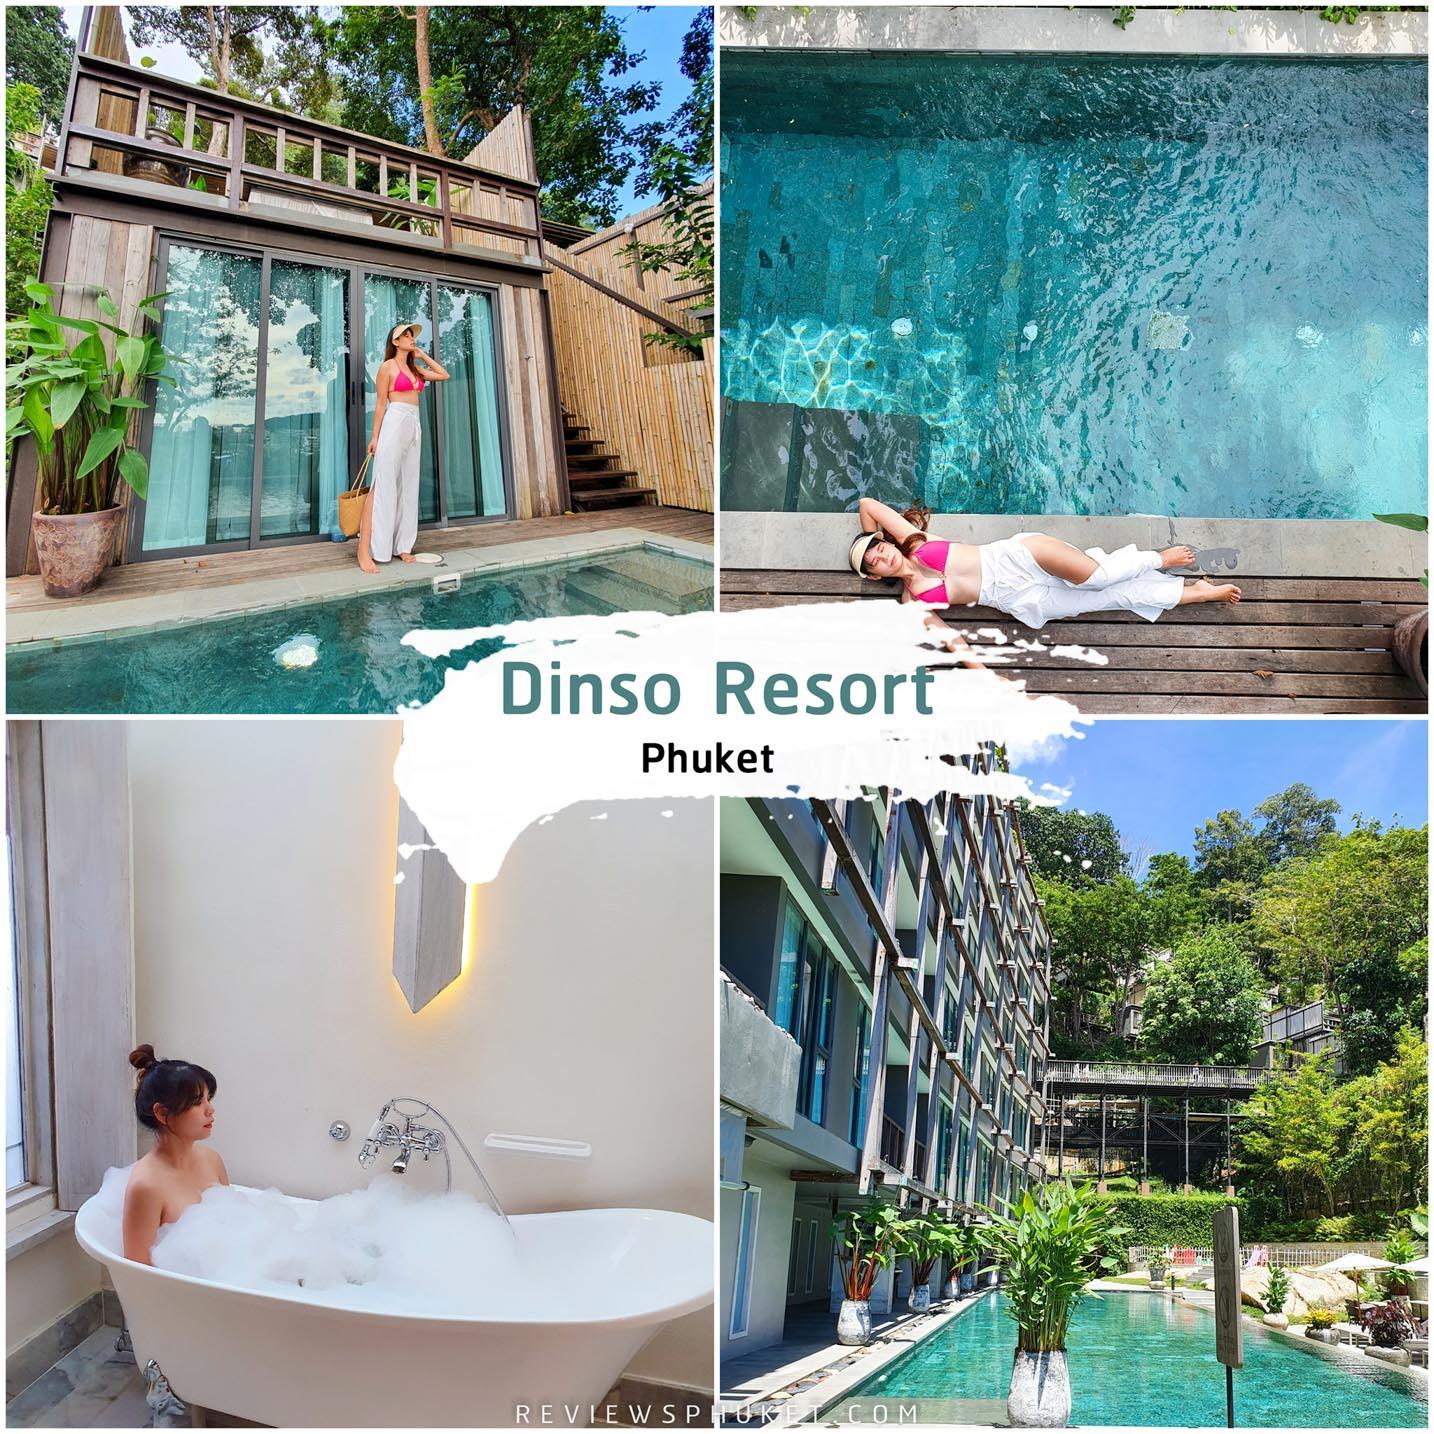 Dinso-Resort-Pool-Villa -บ้านต้นไม้สวยๆภูเก็ตแบบปังๆ-ตั้งอยู่โซนป่าตอง-บรรยากาศชิวๆ-กลางป่า-โรงแรมใช้วัสดุจากไม้มาทำห้องพัก-Type-:-ห้องพักมีดังนี้่--Superior-,-Deluxe-,Family-Suite-Two-Bedroom-,-Penthouse-Triple-Private-Terrace-และ-Pool-Villa-บอกเลยต้องมาเช็คอินน ที่พักภูเก็ต,ที่พักหรู,วิวหลักล้าน,ริมทะเล,โรงแรม,รีสอร์ท,Phuket,หาดสวย,น้ำใส